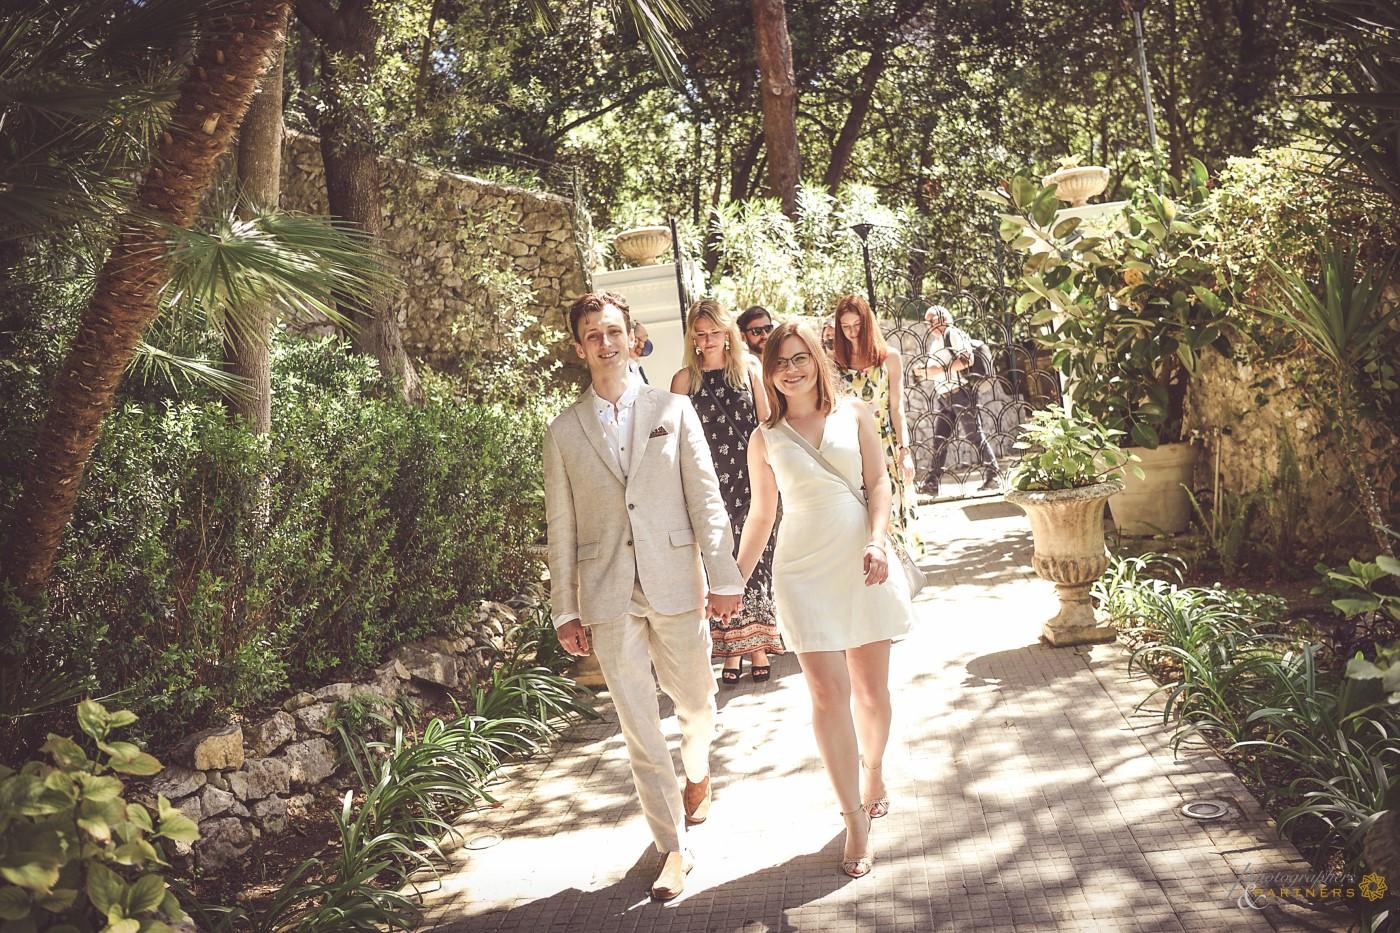 We enter in the villa 🍃